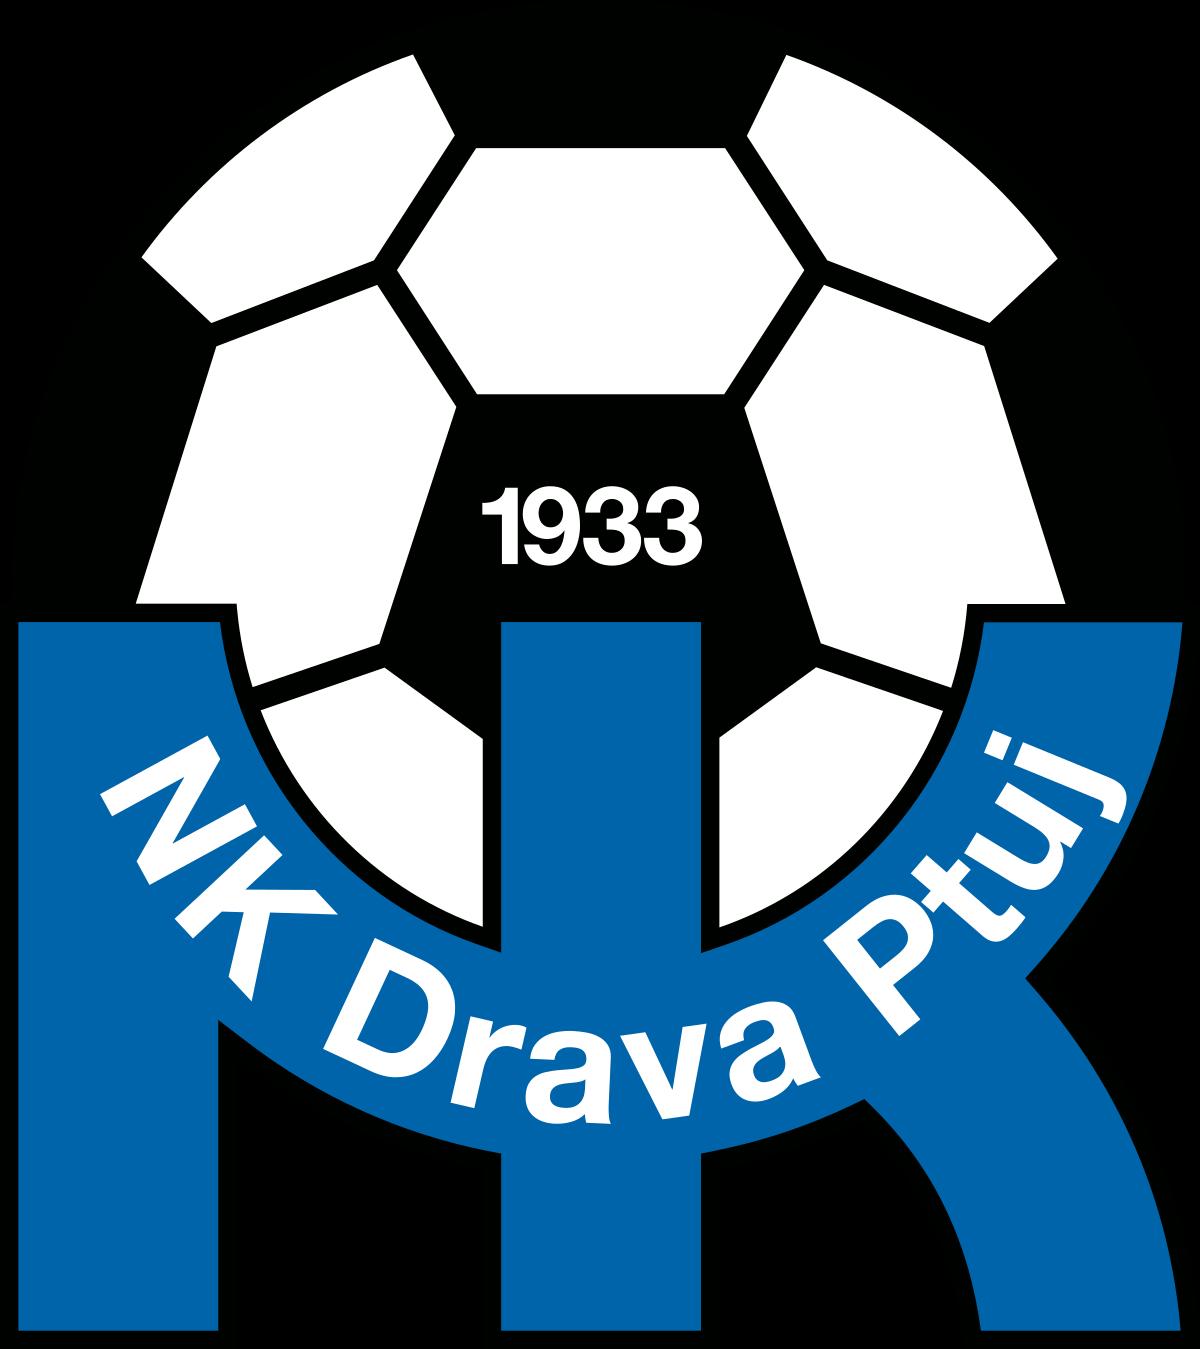 Drava logo